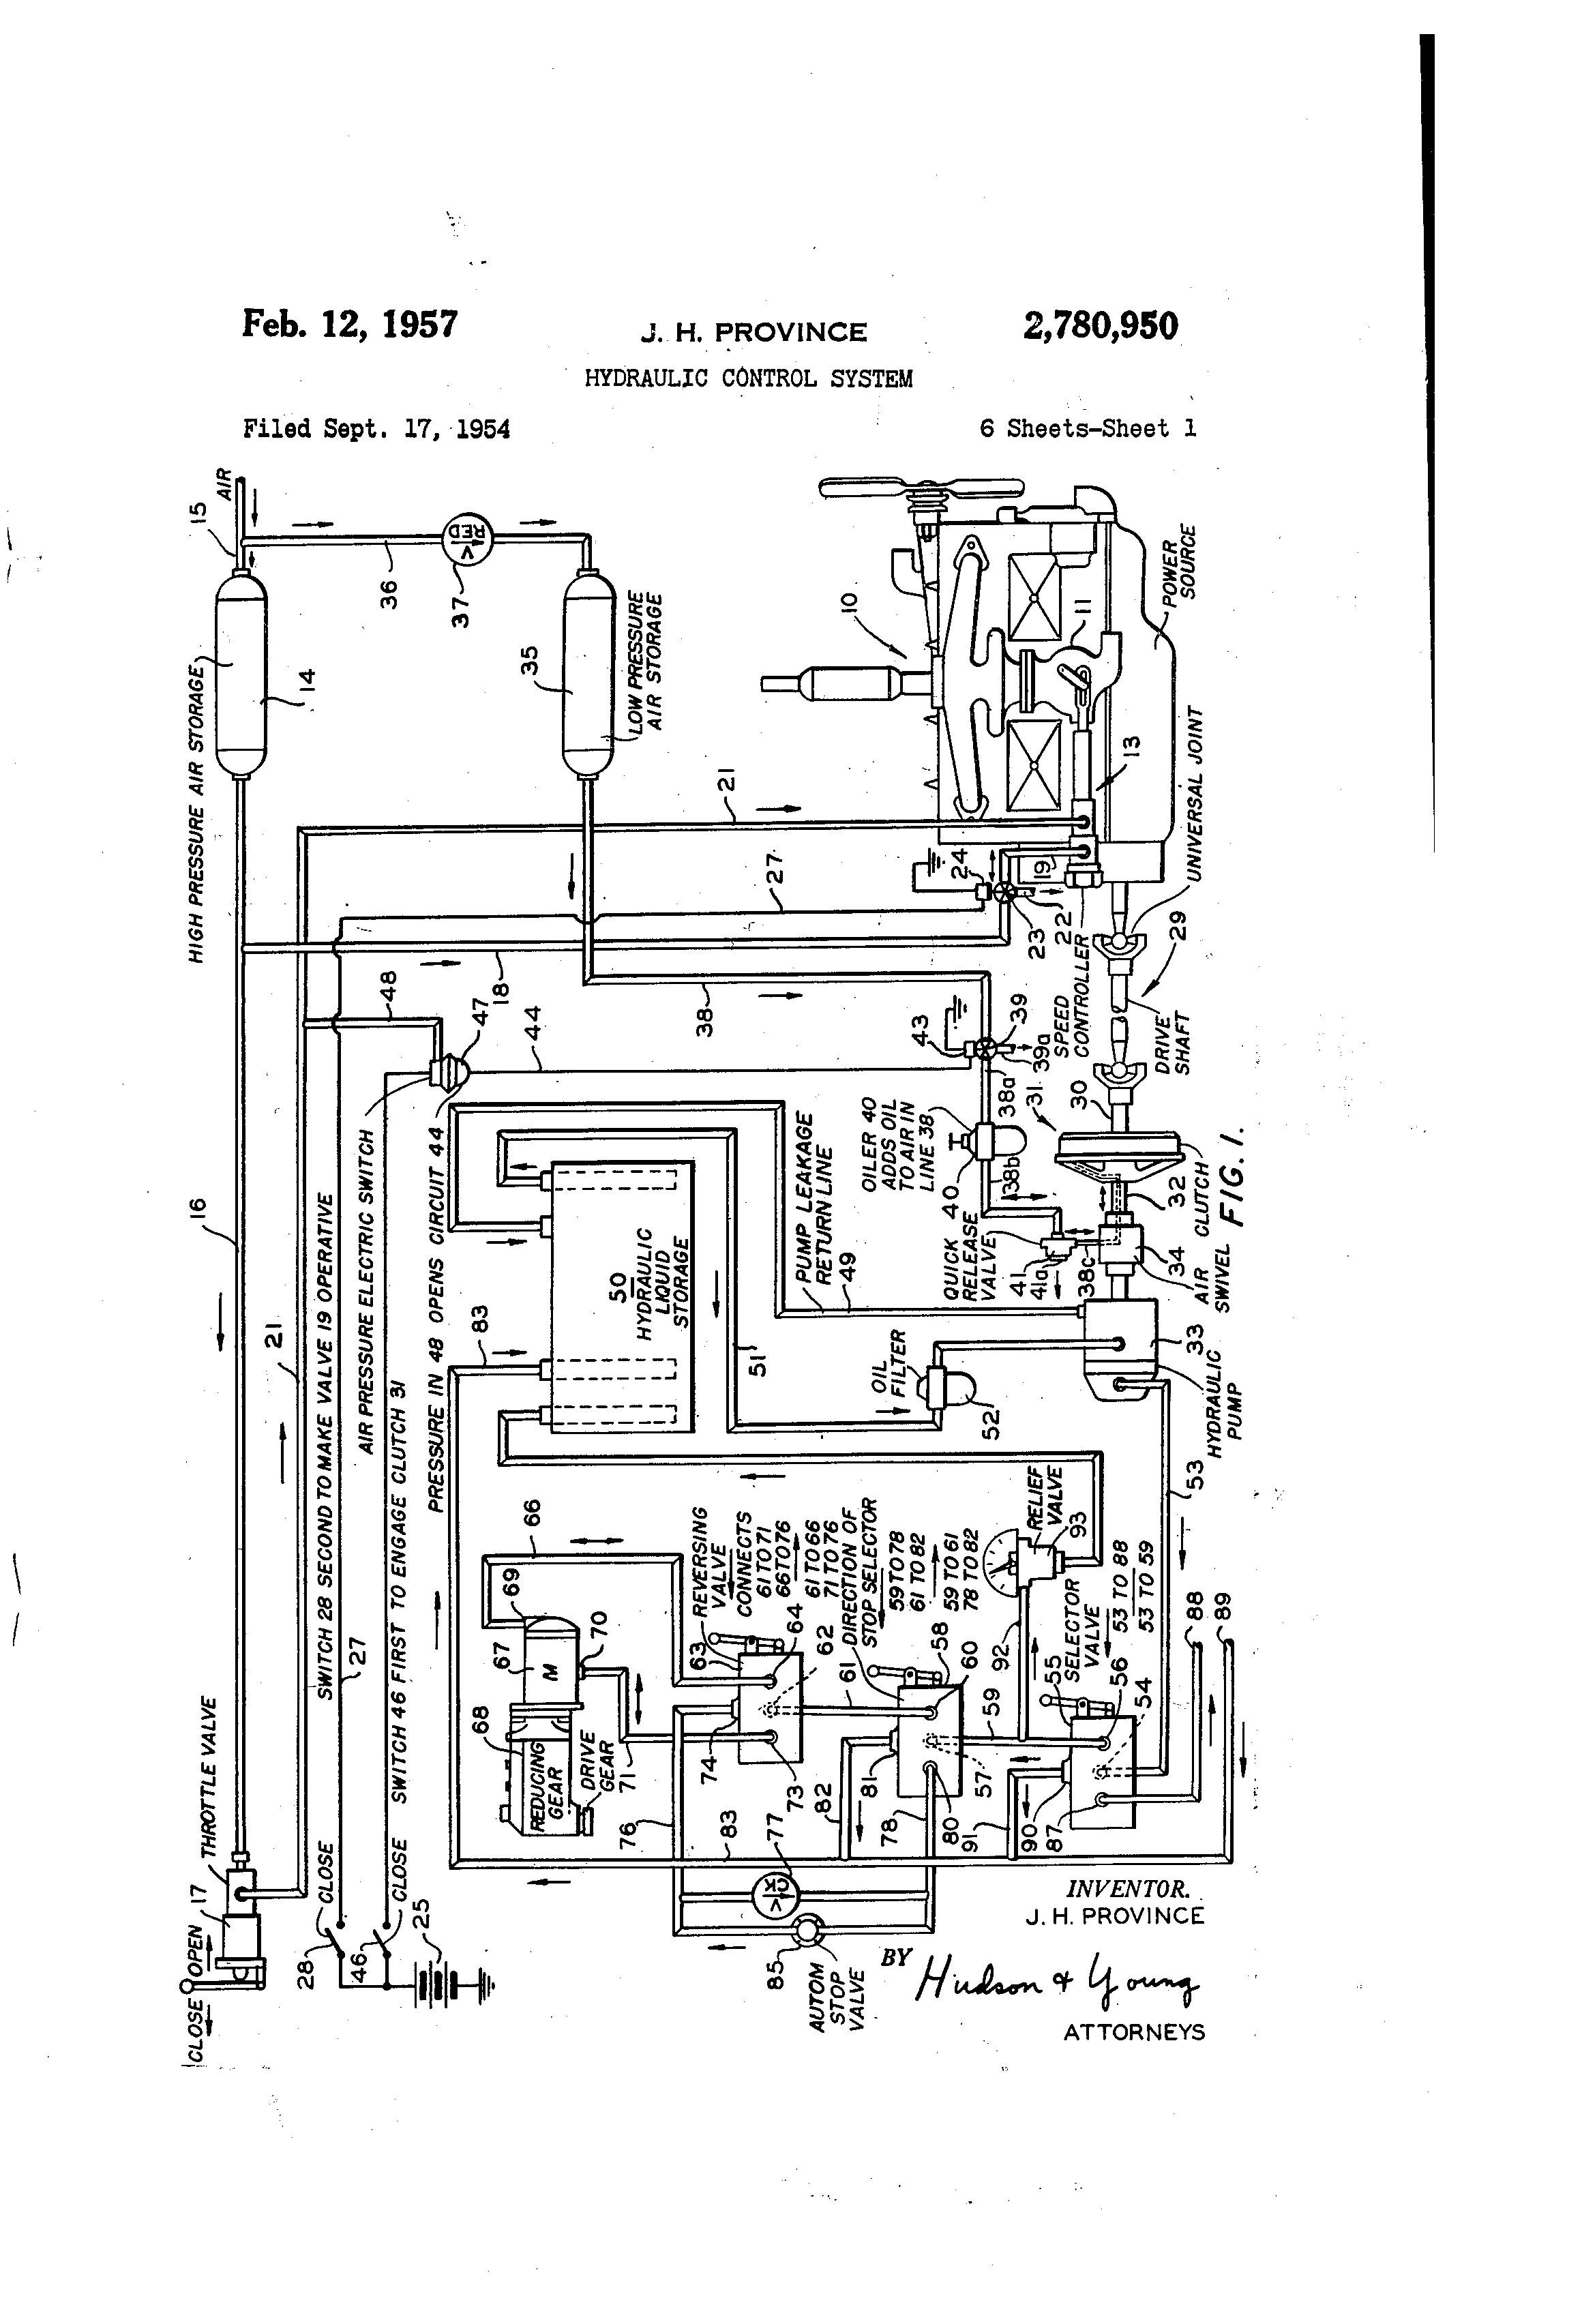 patent us2780950 - hydraulic control system